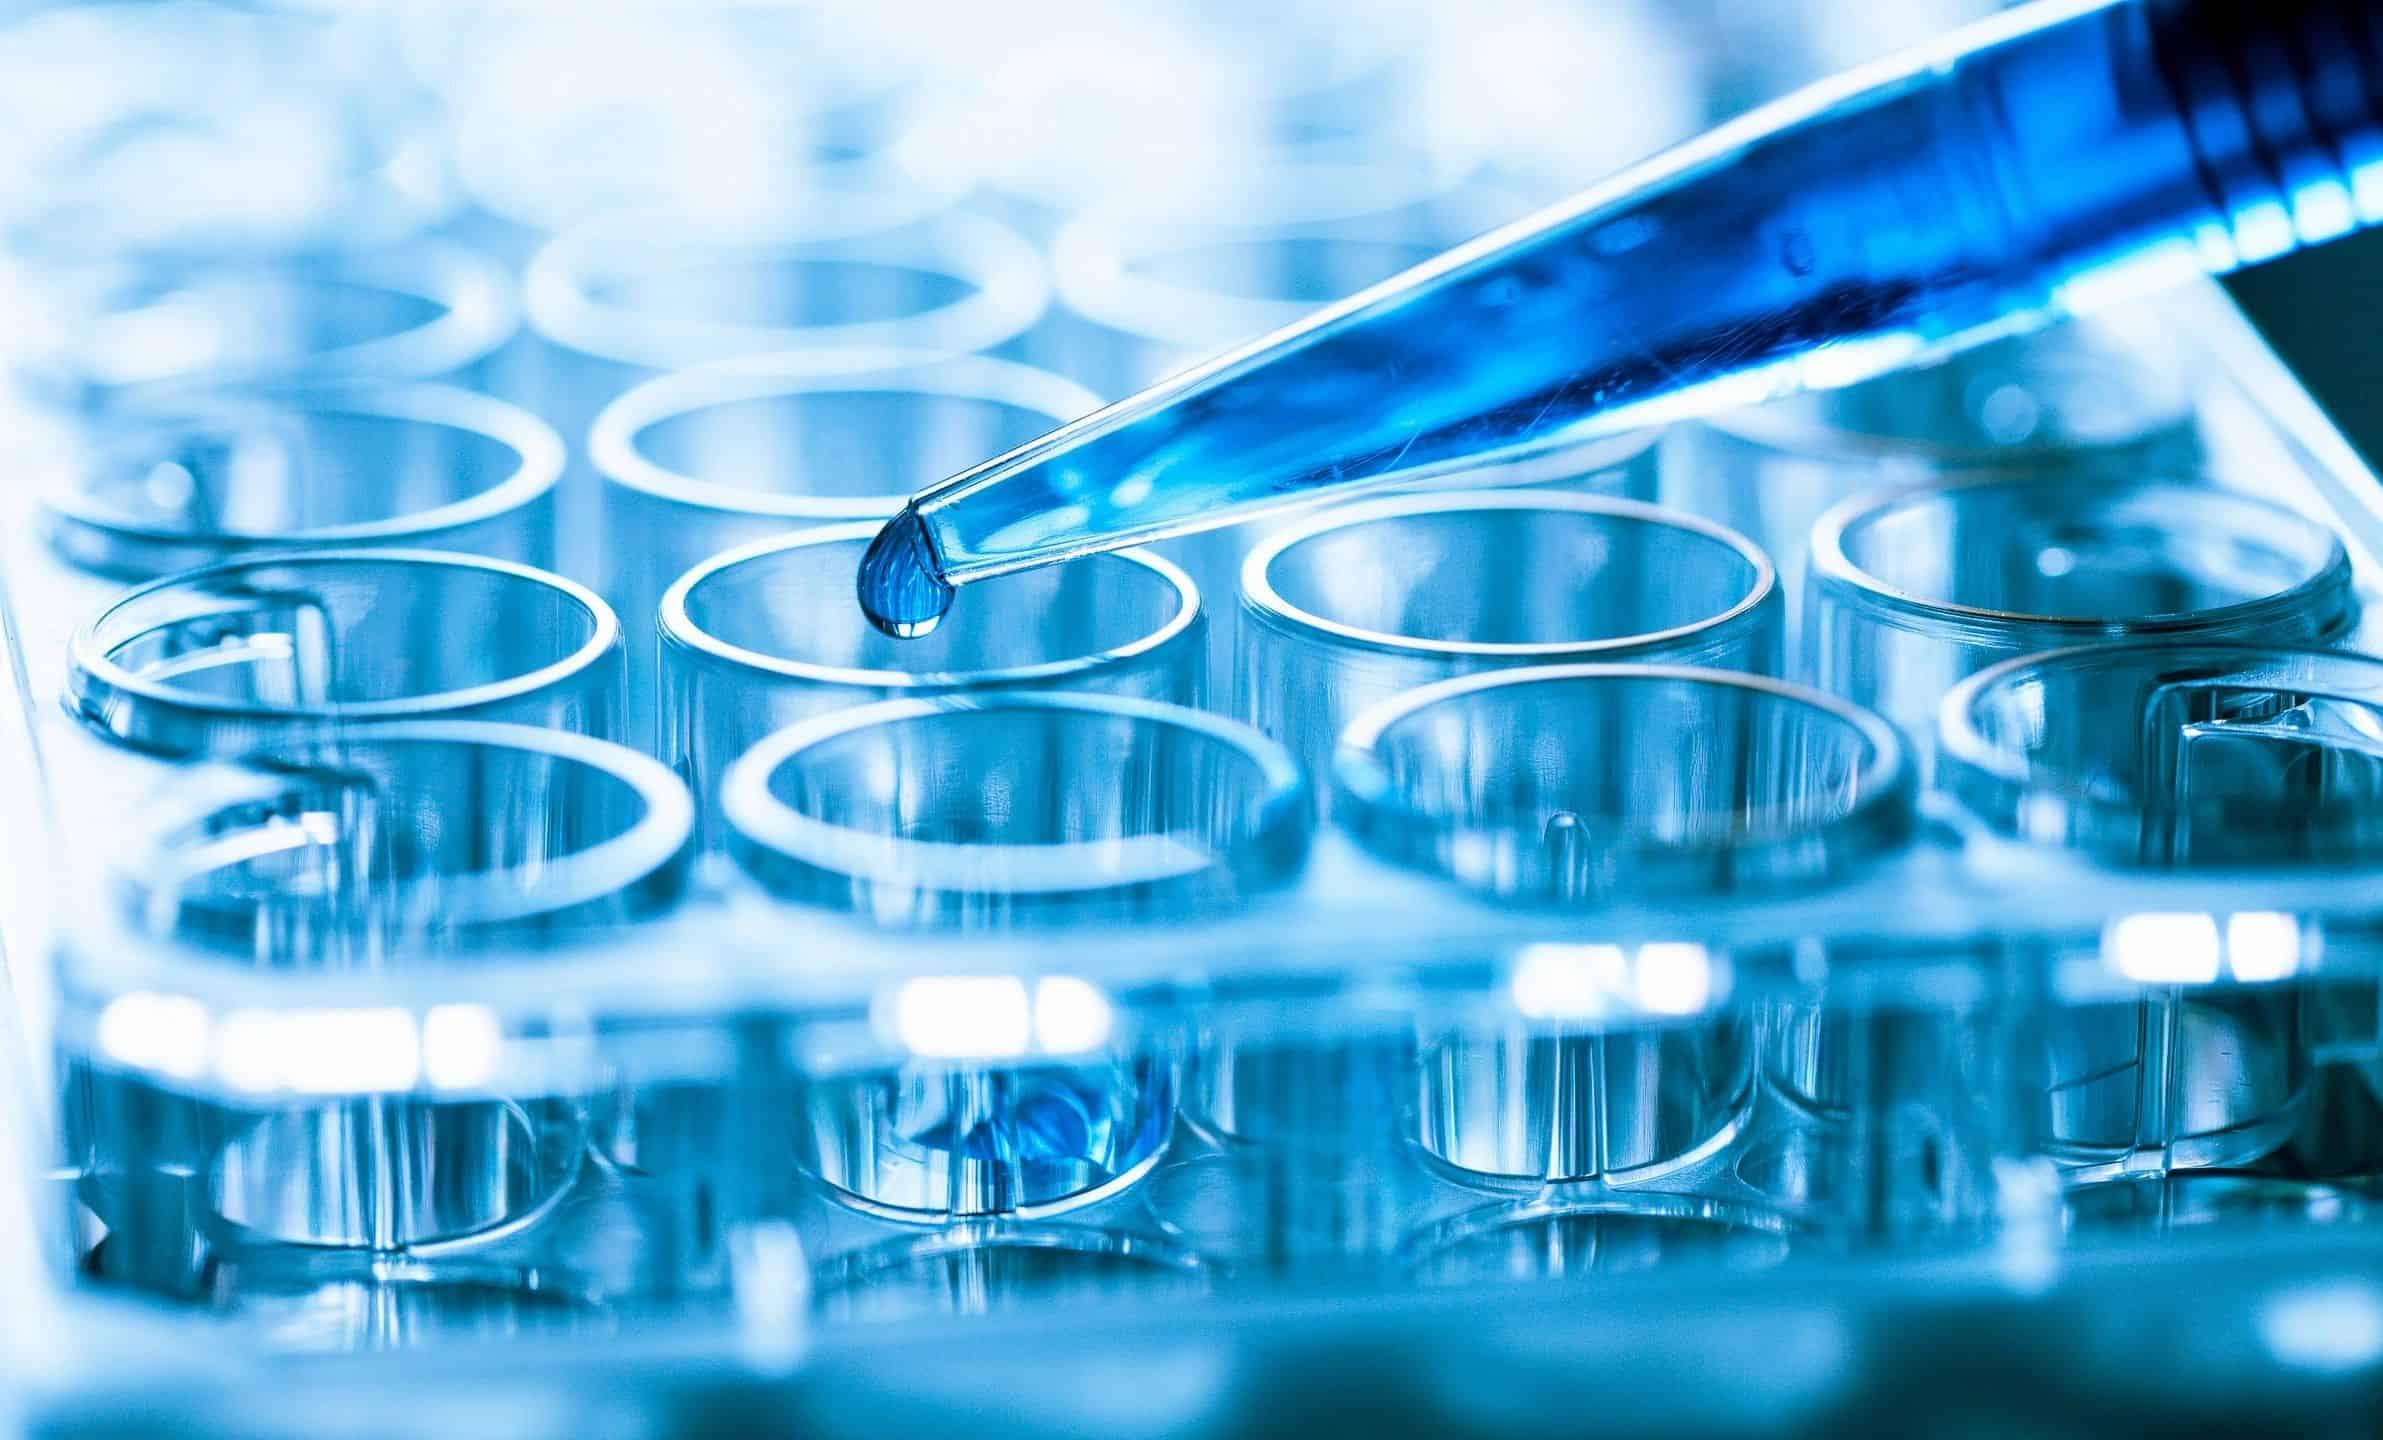 Combination drug product development